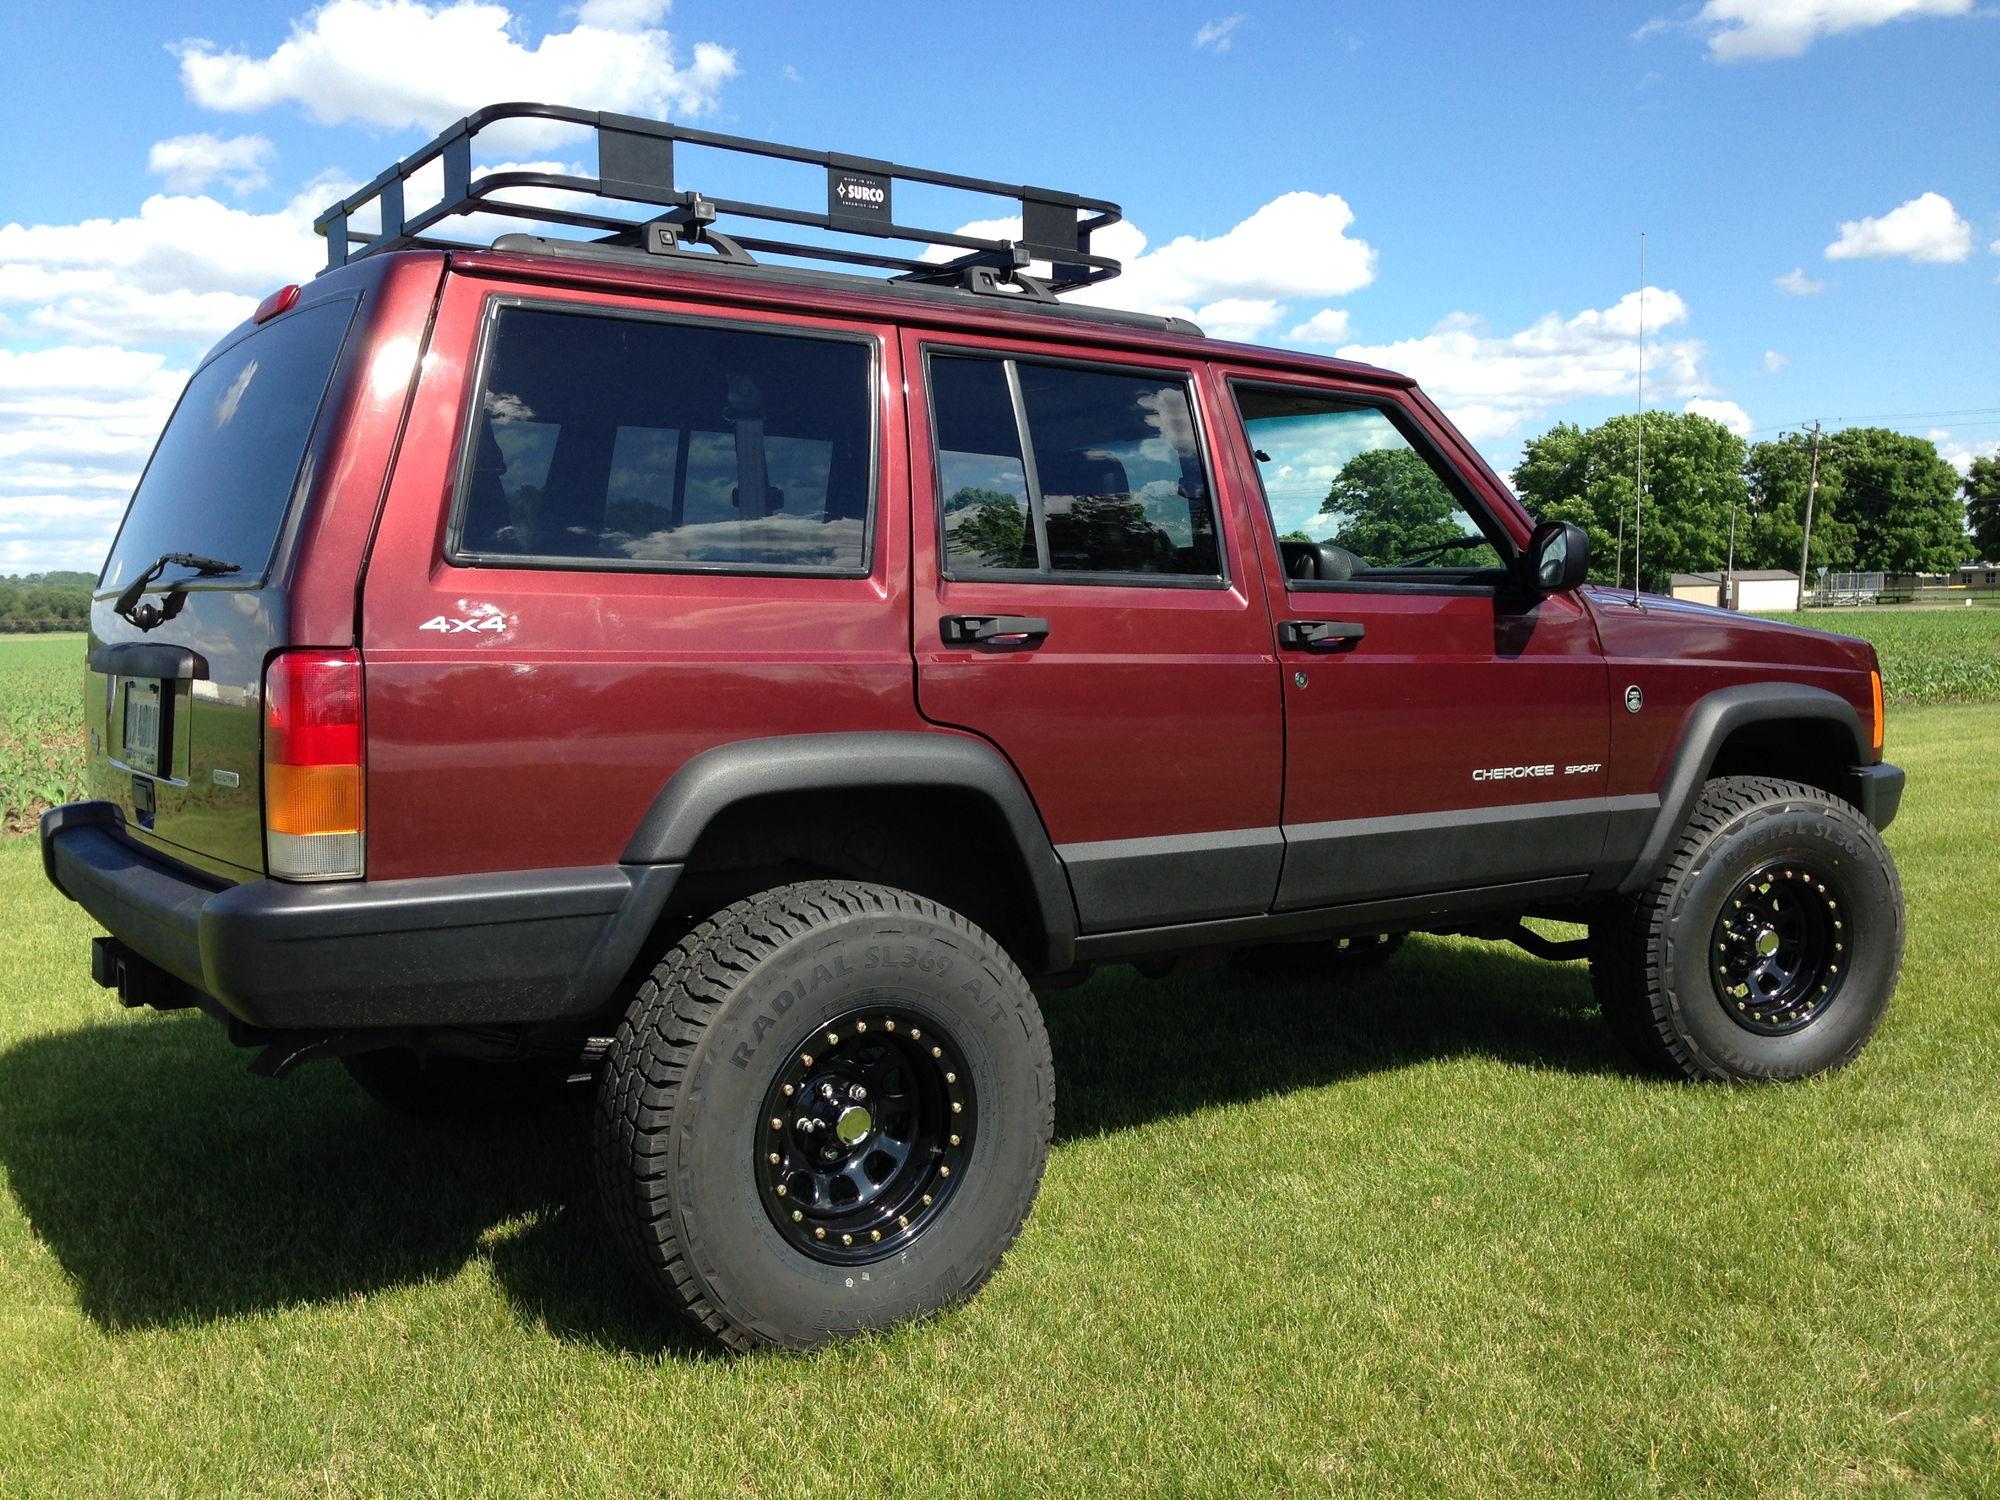 xj lift tire setup thread page 59 jeep cherokee forum. Black Bedroom Furniture Sets. Home Design Ideas